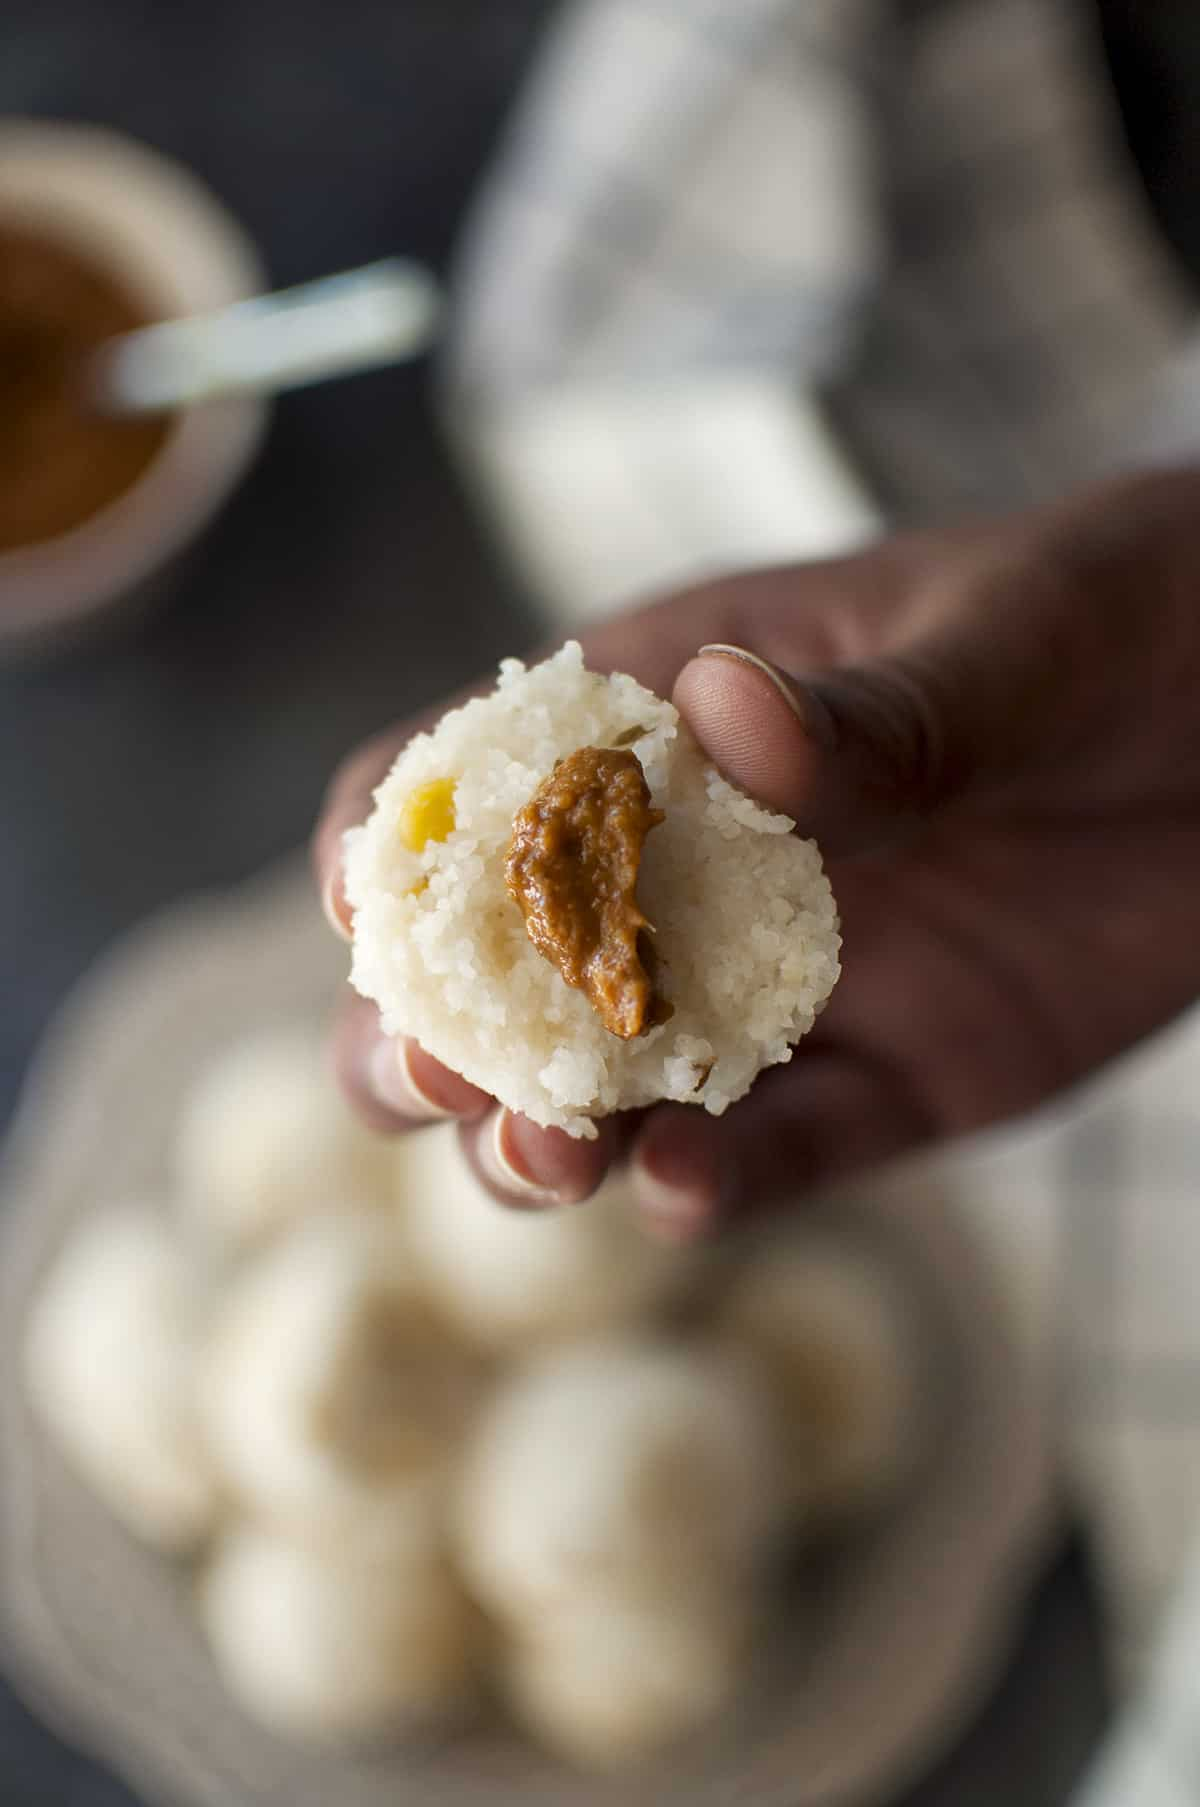 Hand holding half kudumu topped with ginger chutney